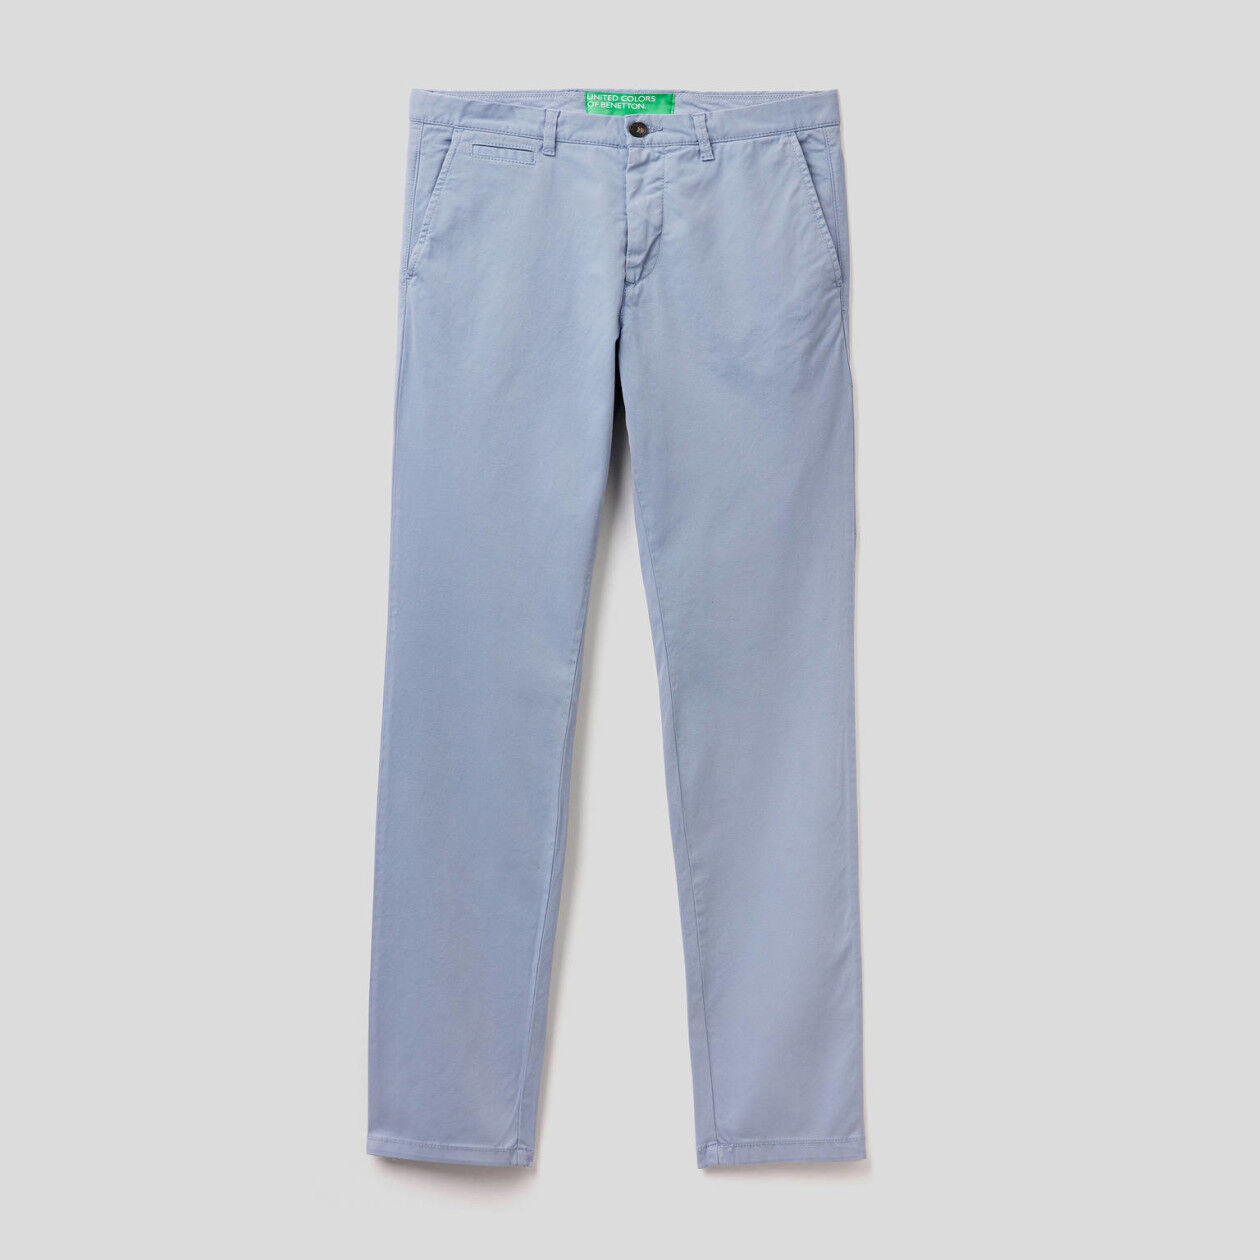 Light blue slim fit chinos